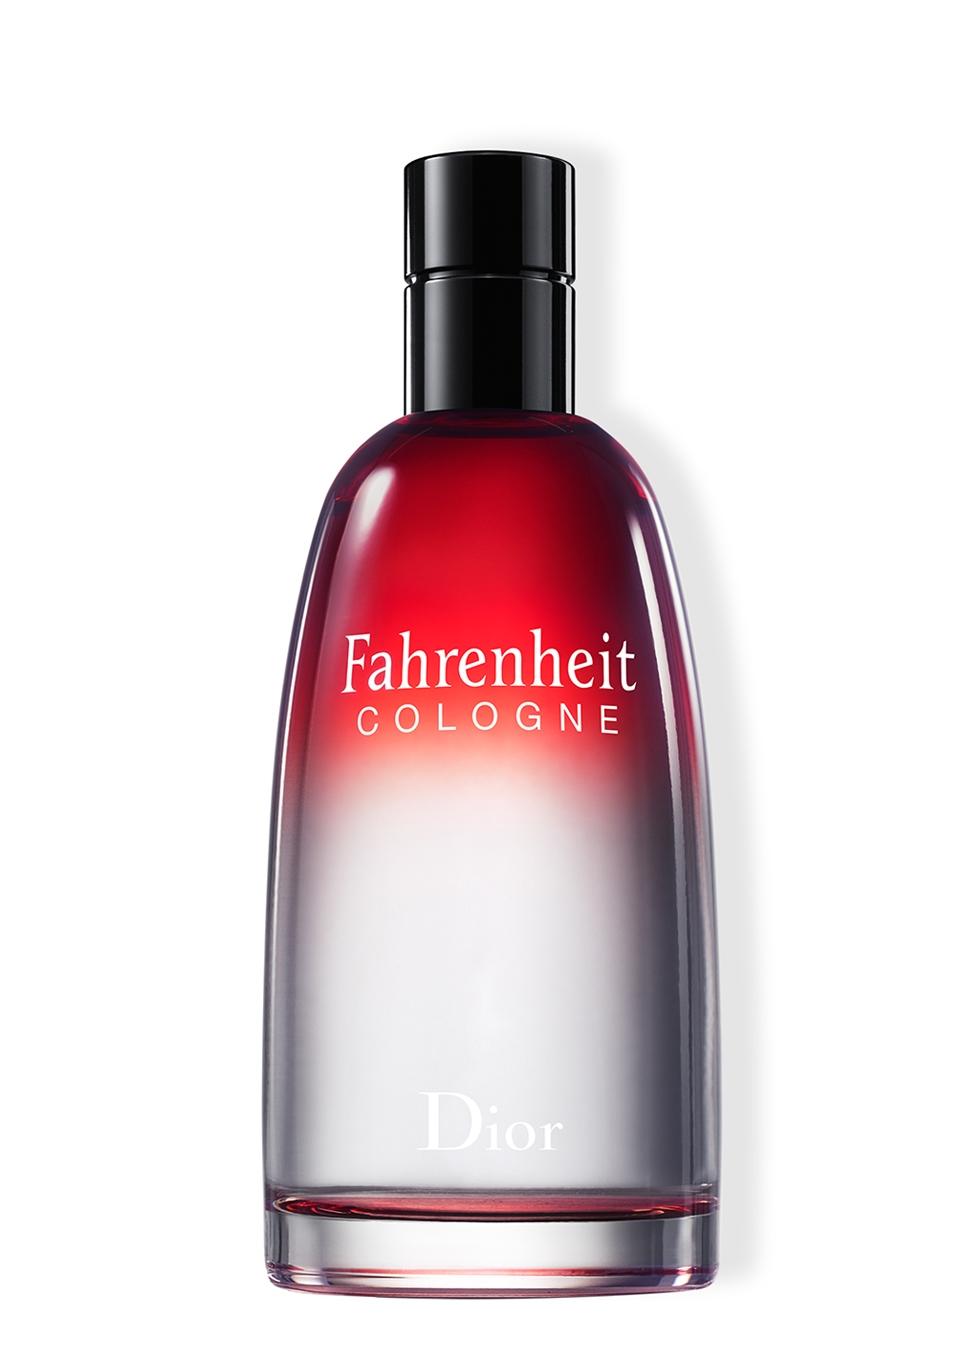 Fahrenheit Cologne 125ml